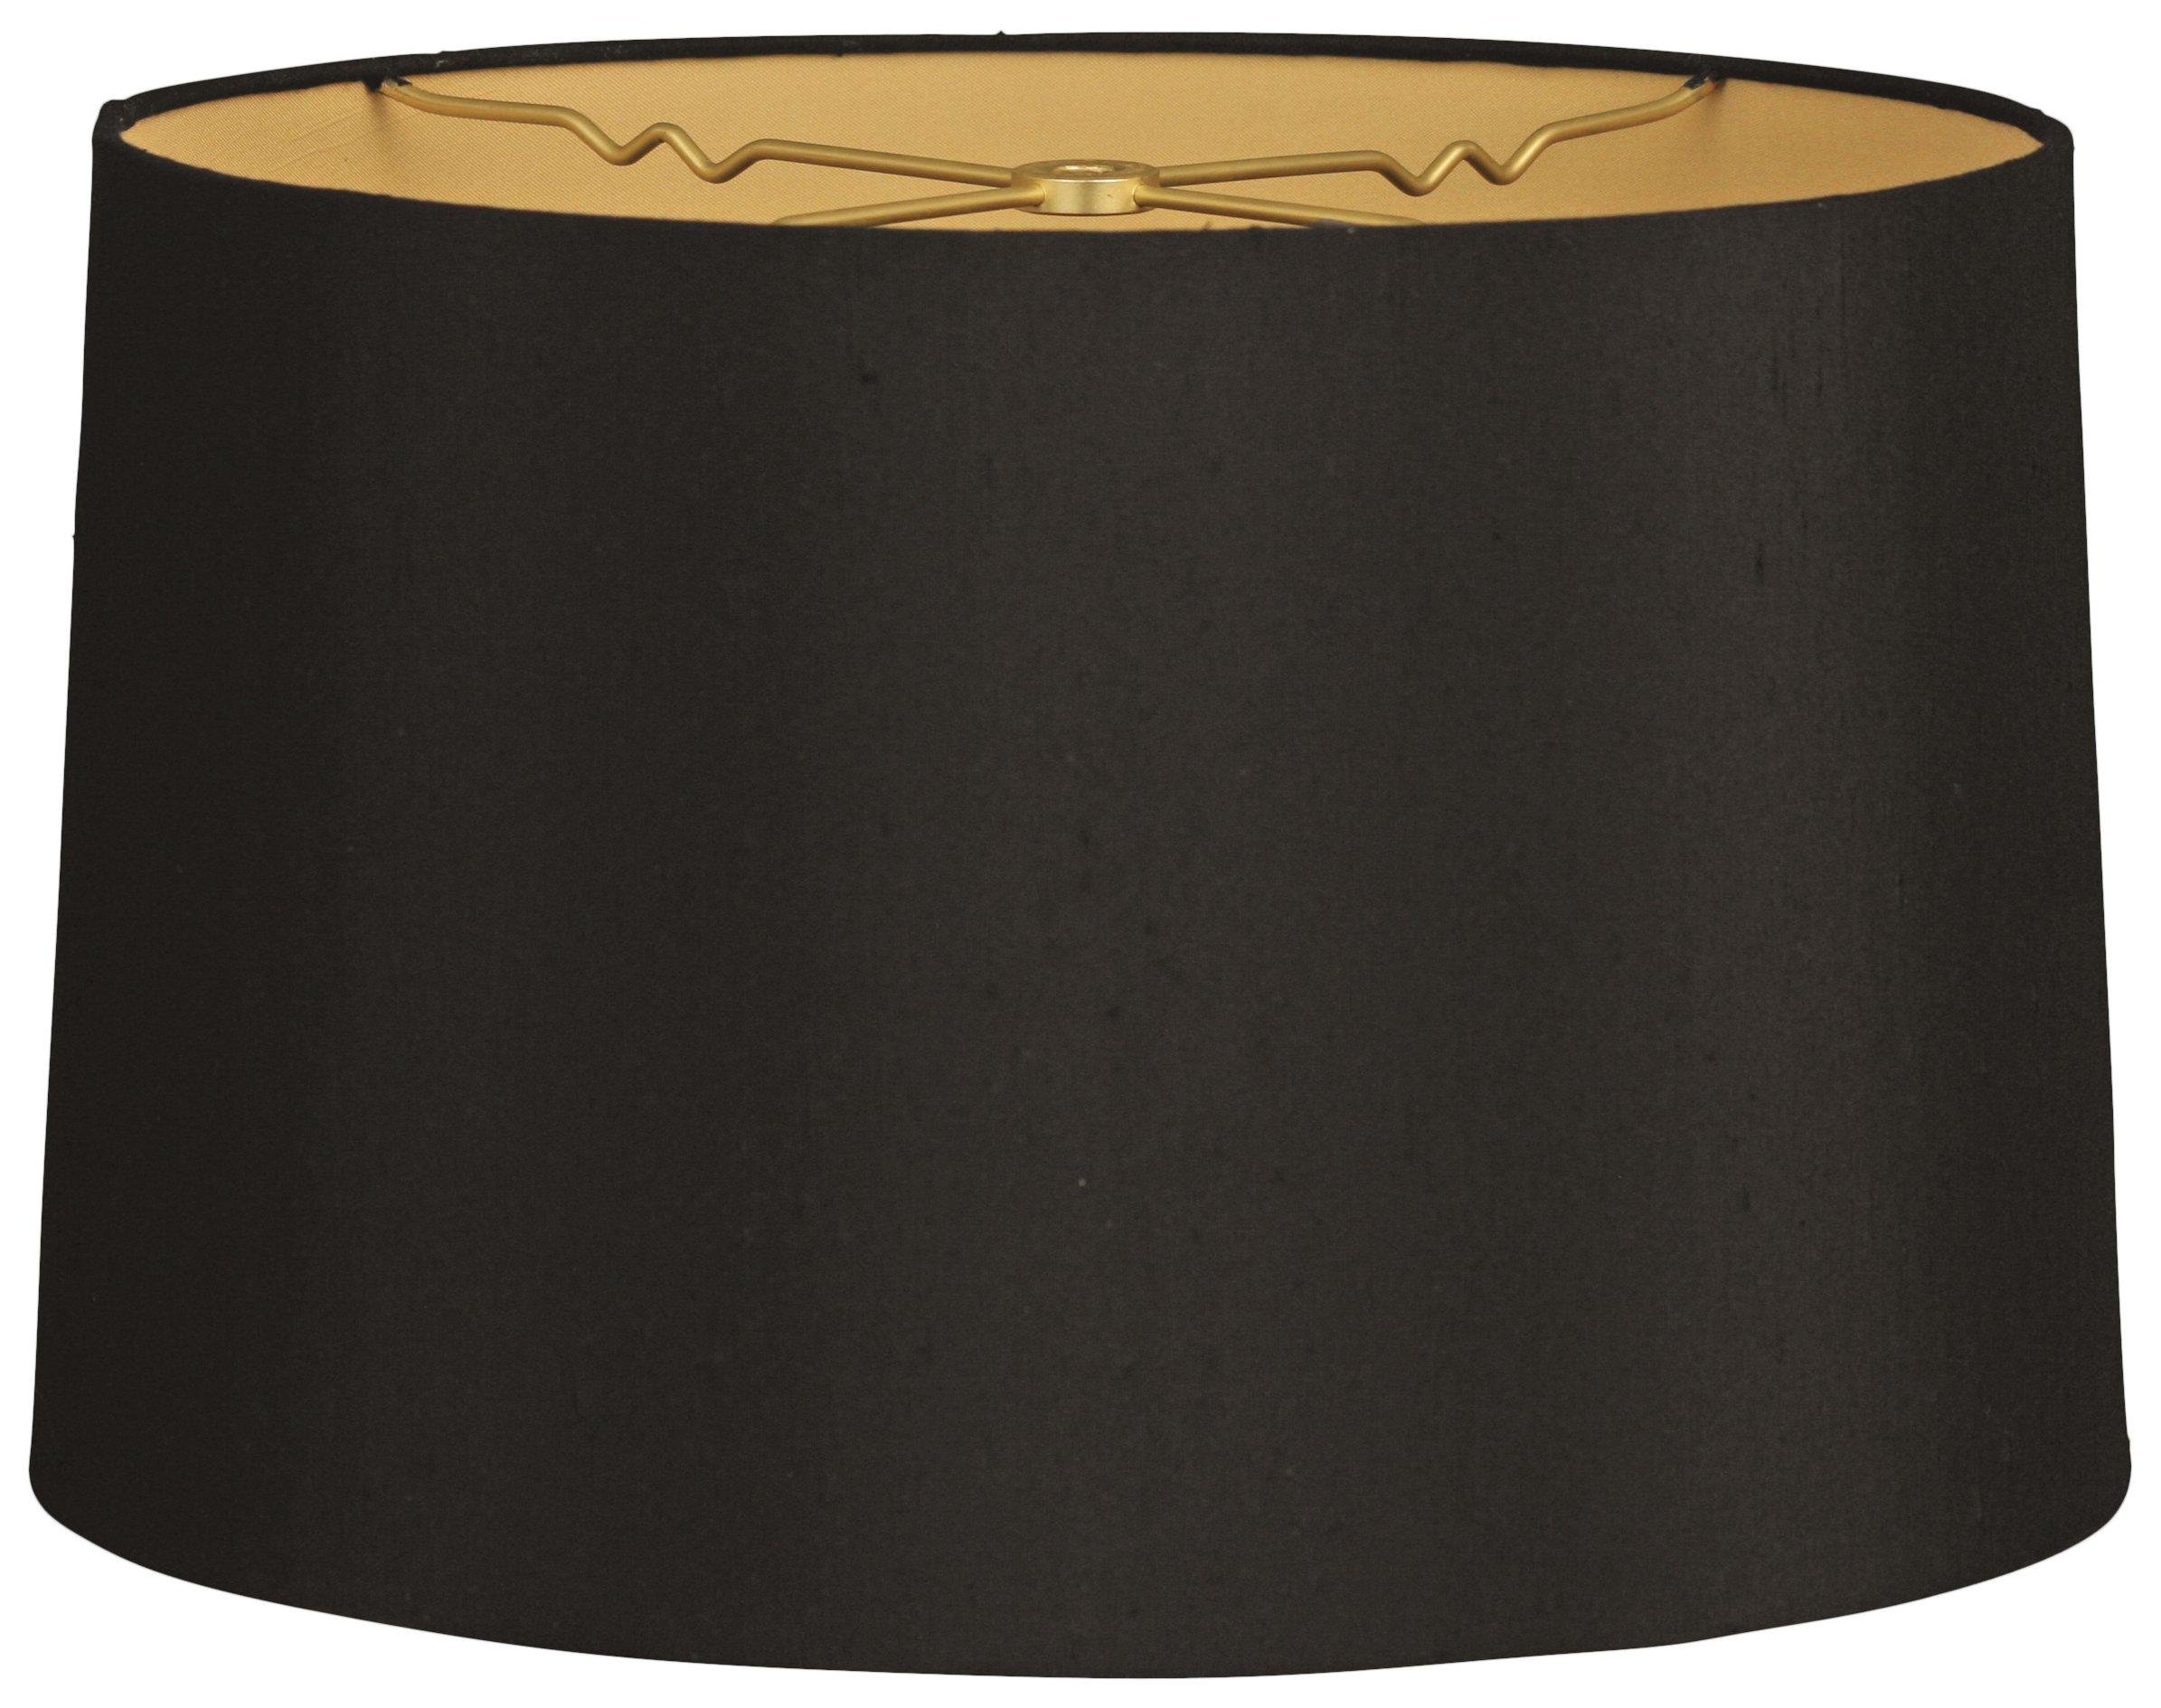 Royal Designs HB-610-18BLK/GL Shallow Drum Hardback Lamp Shade, 17 x 18 x 11.5, Black